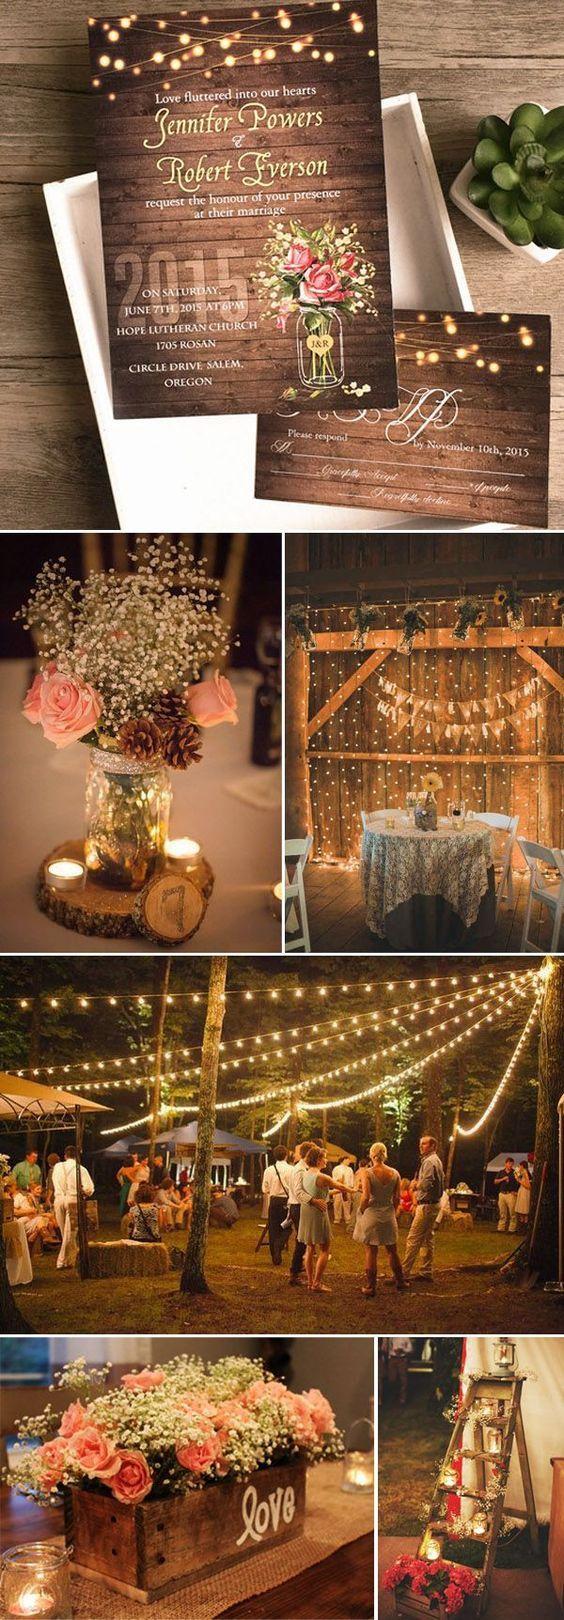 Wedding decoration ideas at church  spring flower mason jar string lights rustic invitations EWI